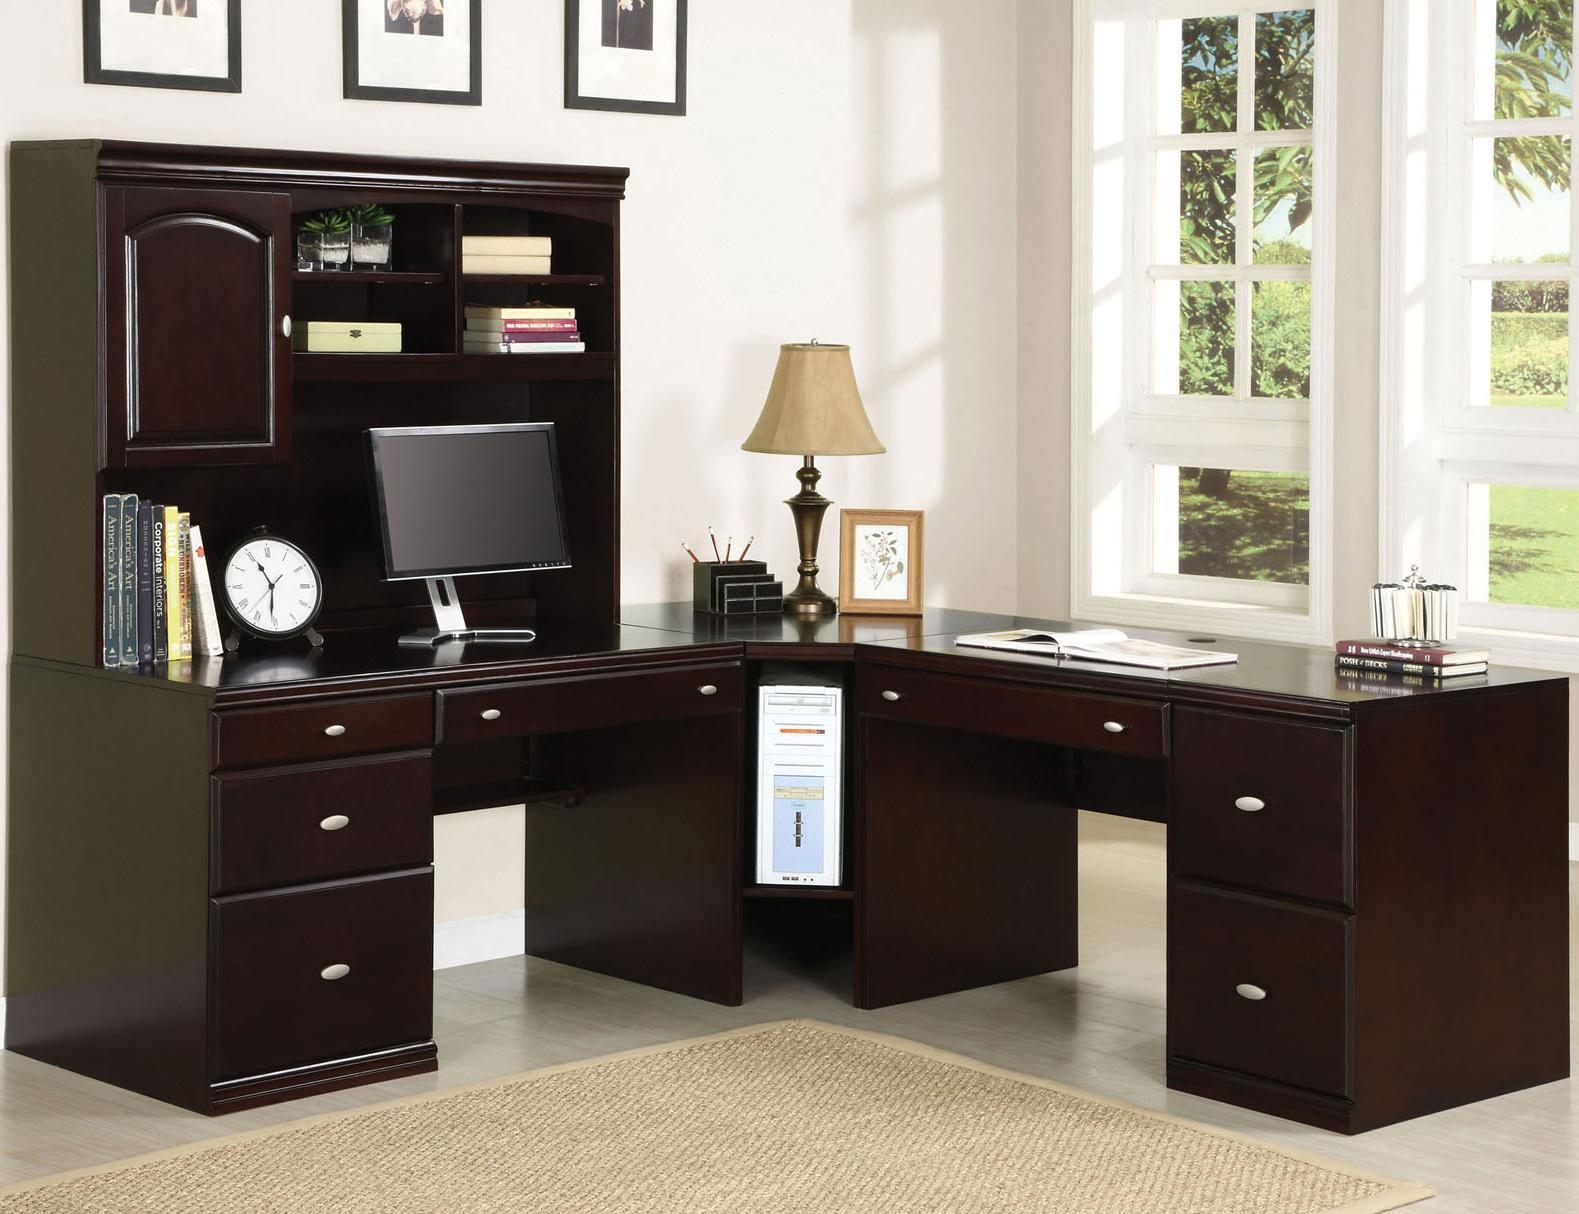 Nice Acme Furniture Cape Corner Desk W/ Hutch